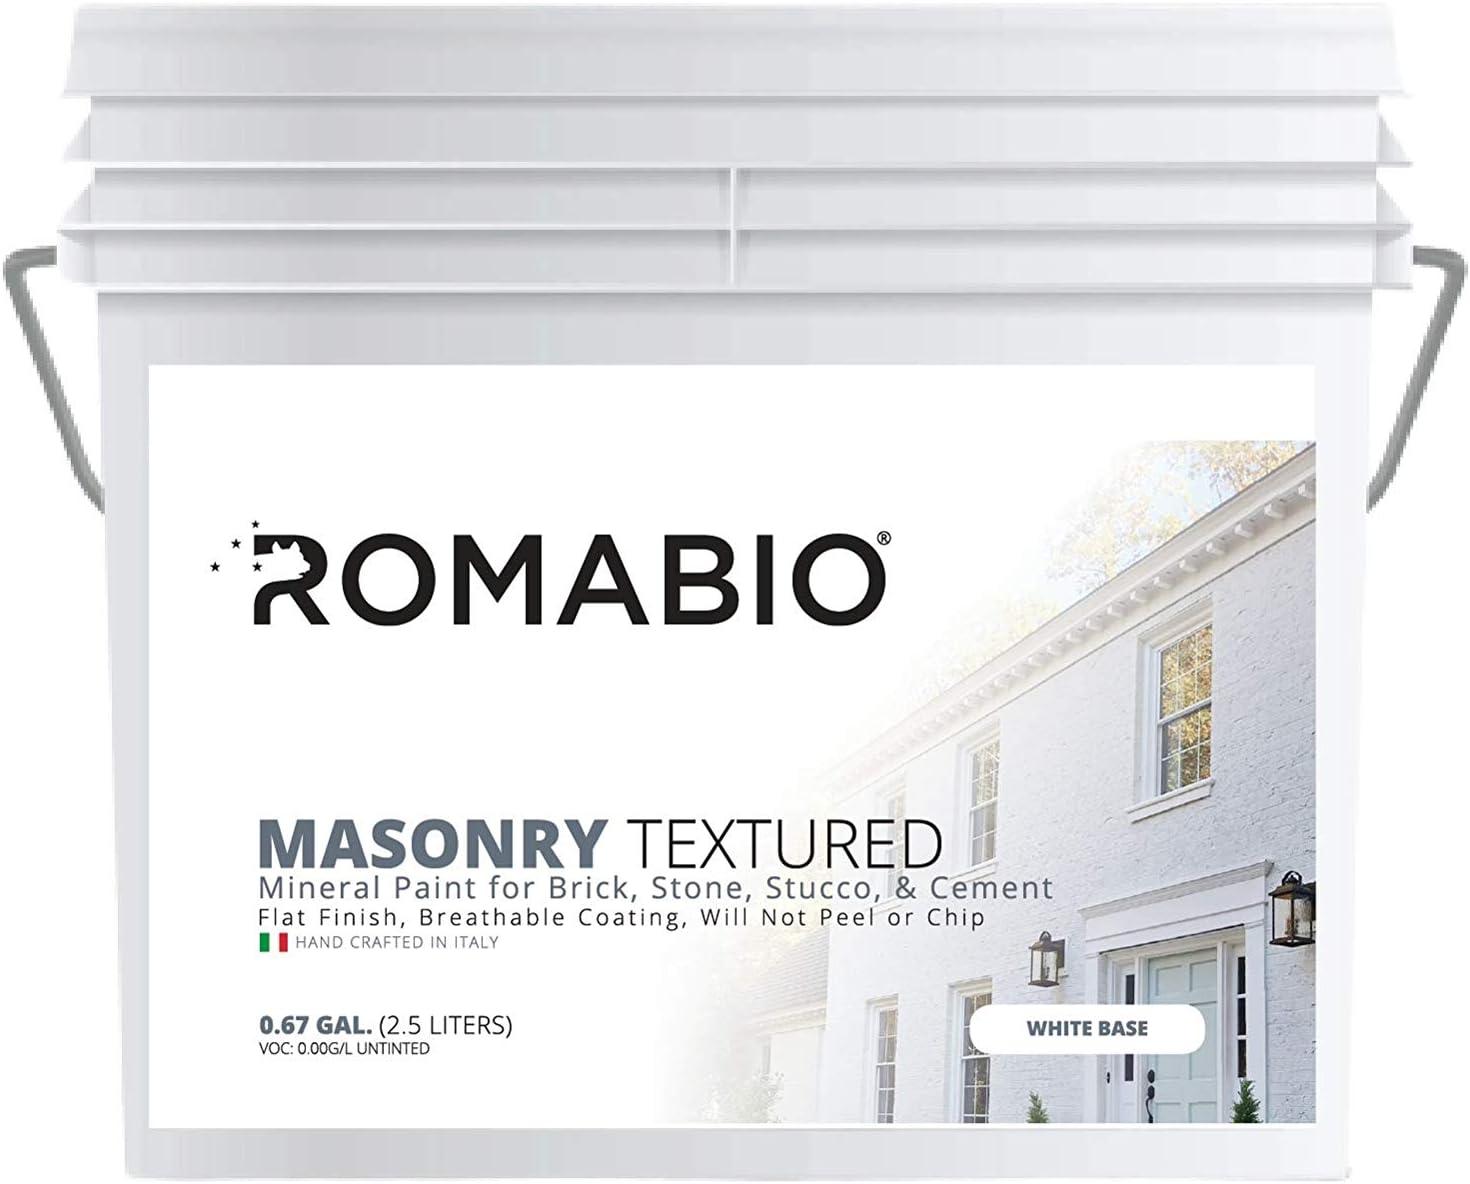 Romabio Masonry Textured Paints